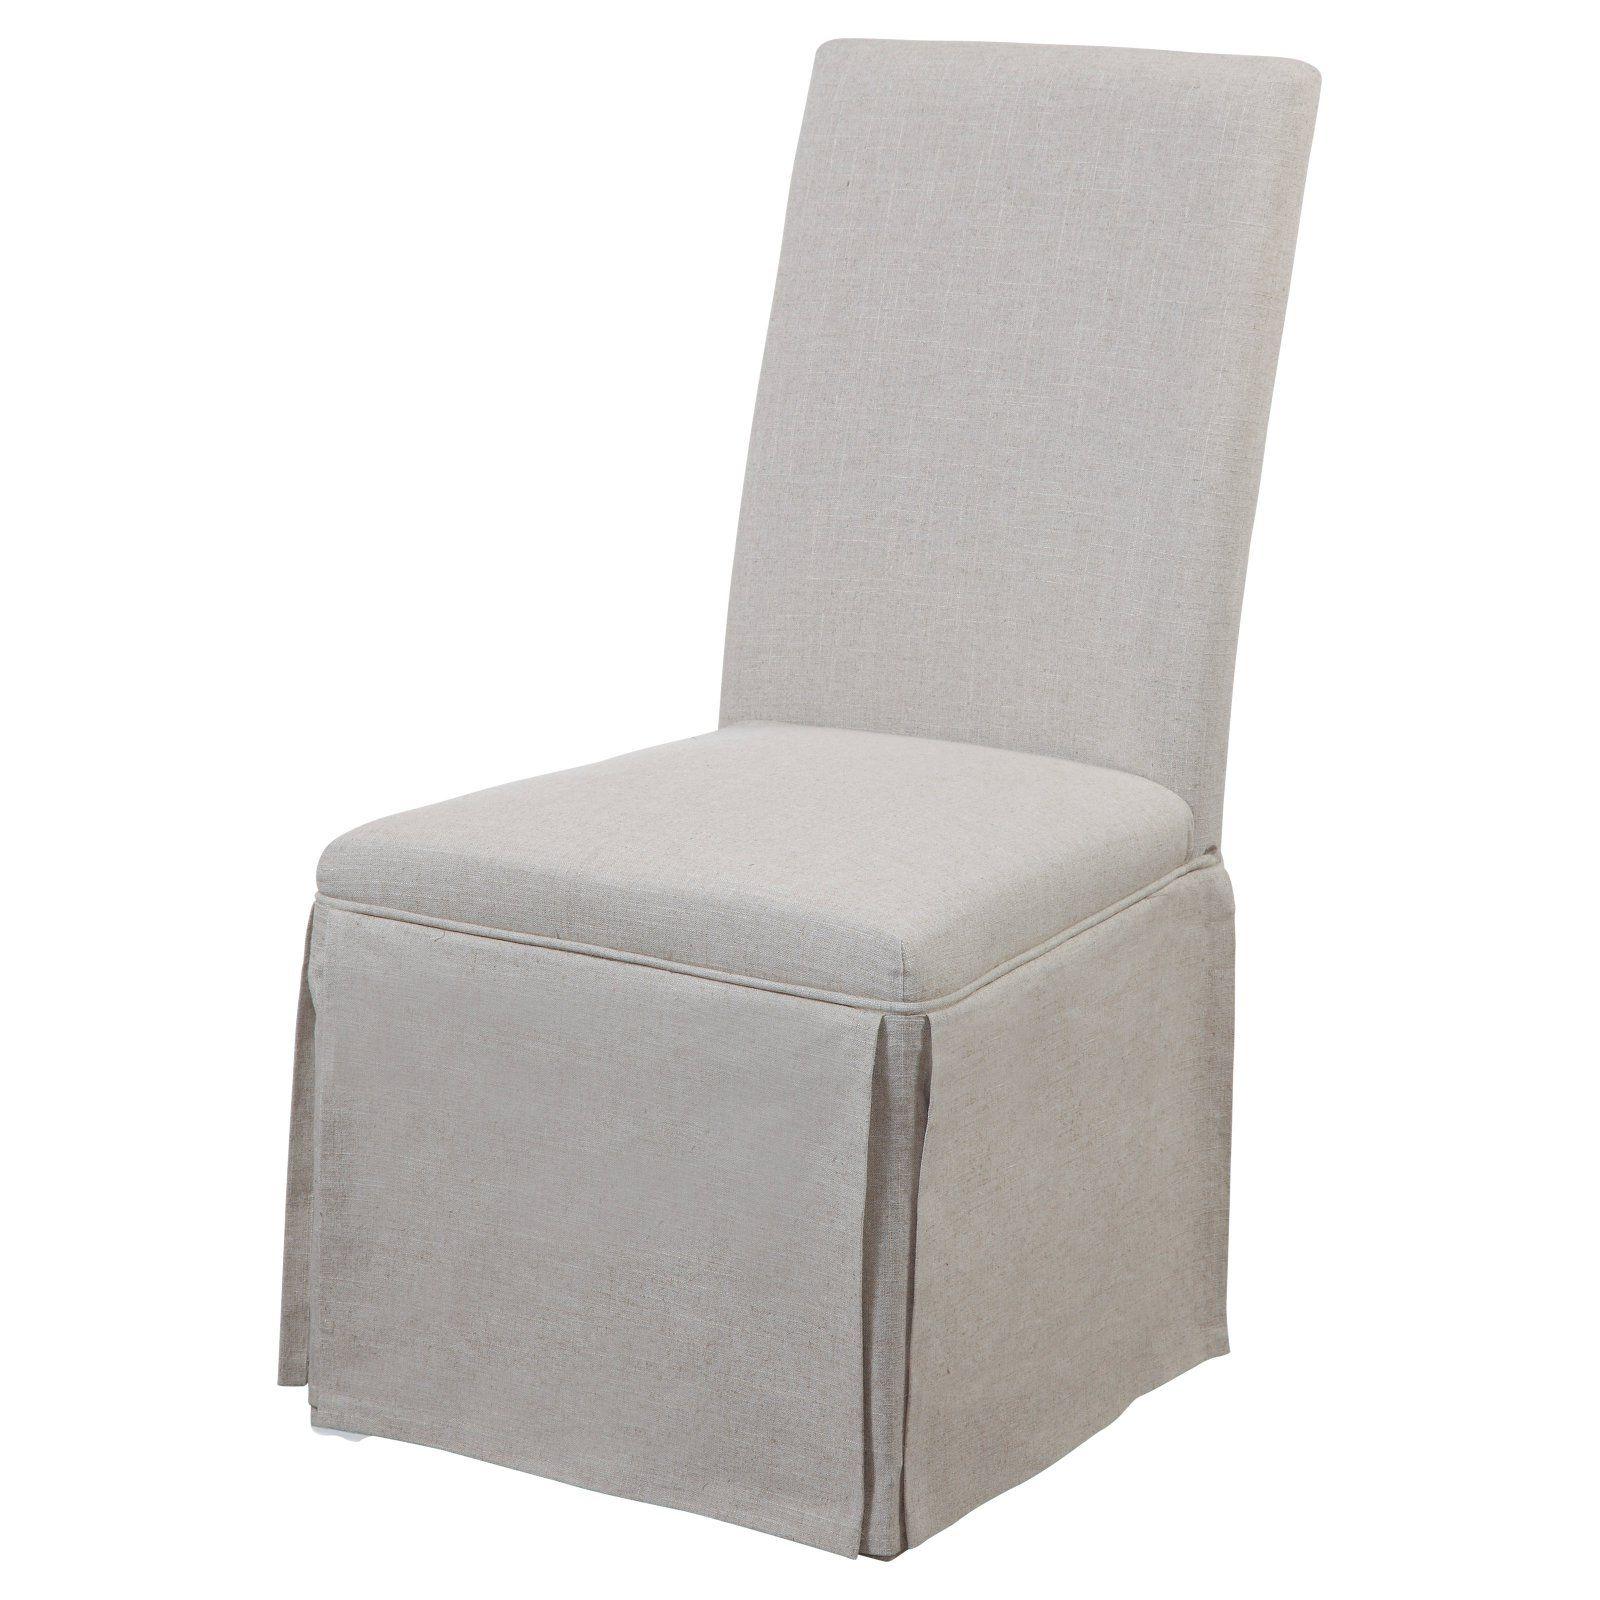 Astonishing Bassett Mirror Skirted Dining Parson Chair Set Of 2 Gray Ibusinesslaw Wood Chair Design Ideas Ibusinesslaworg